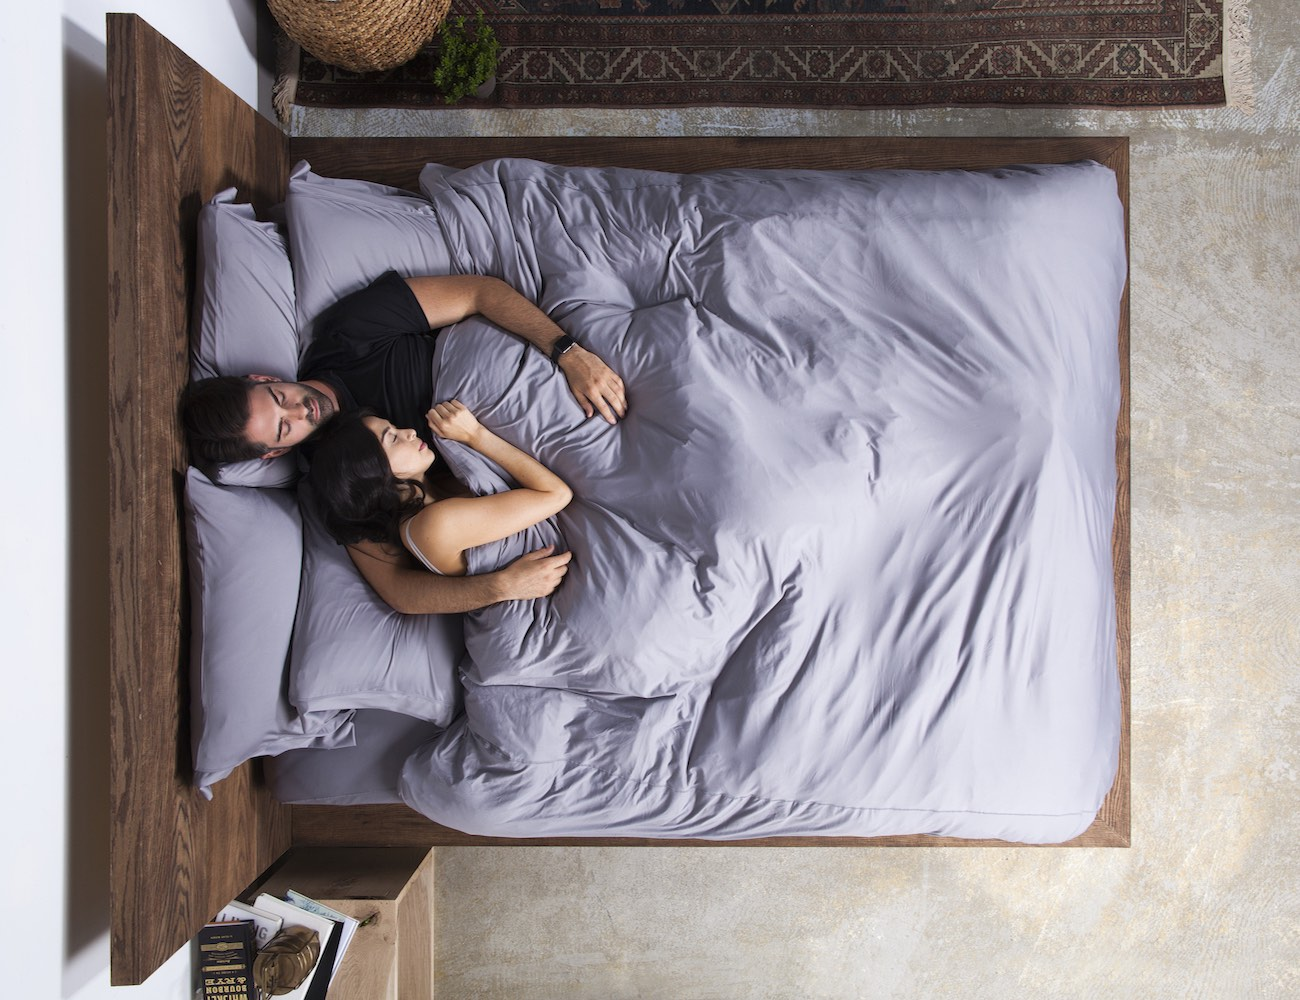 SHEEX® Performance Bedding and Sleepwear